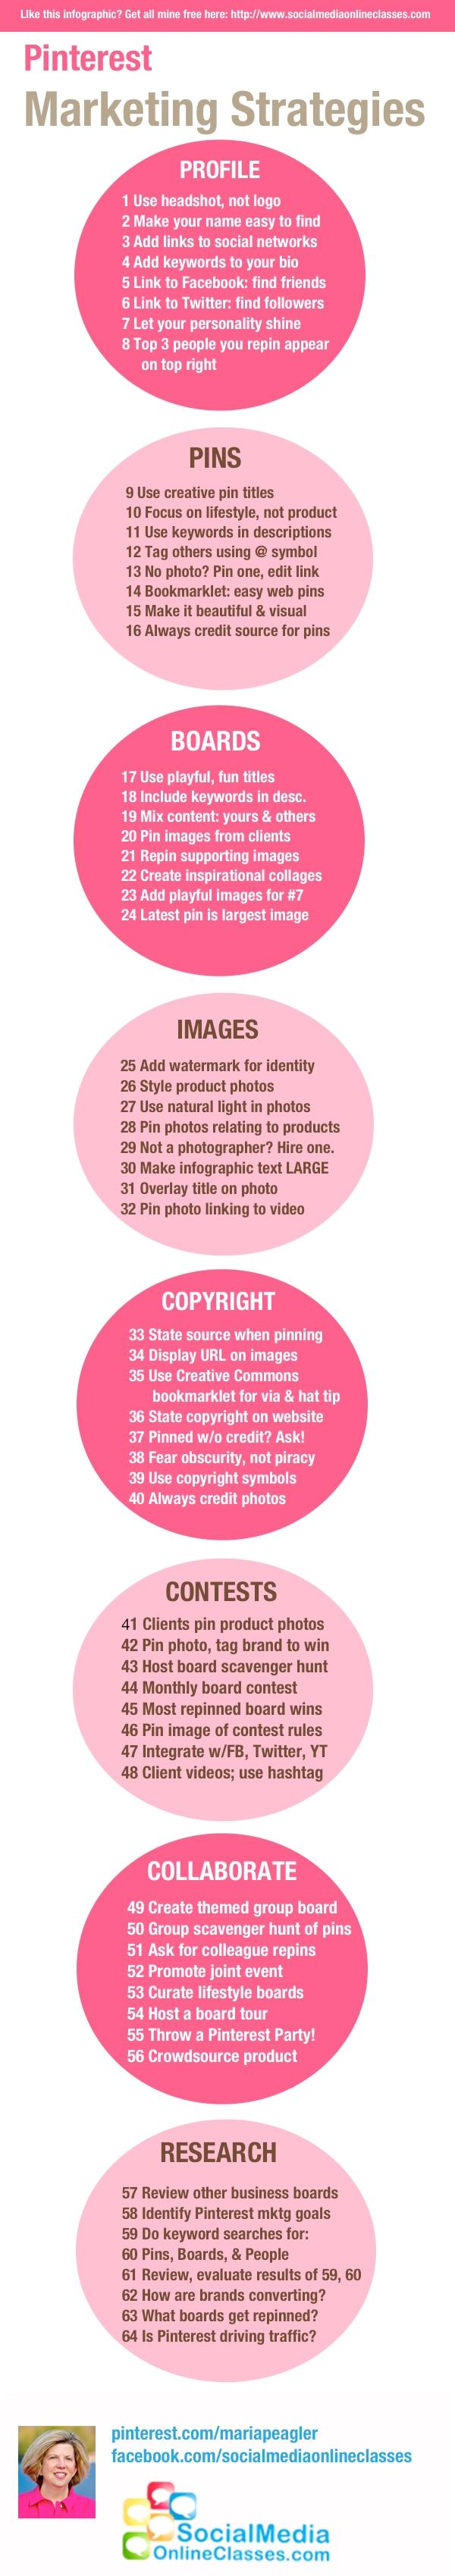 the-marketing-factory-pinterest-marketing-infographic-